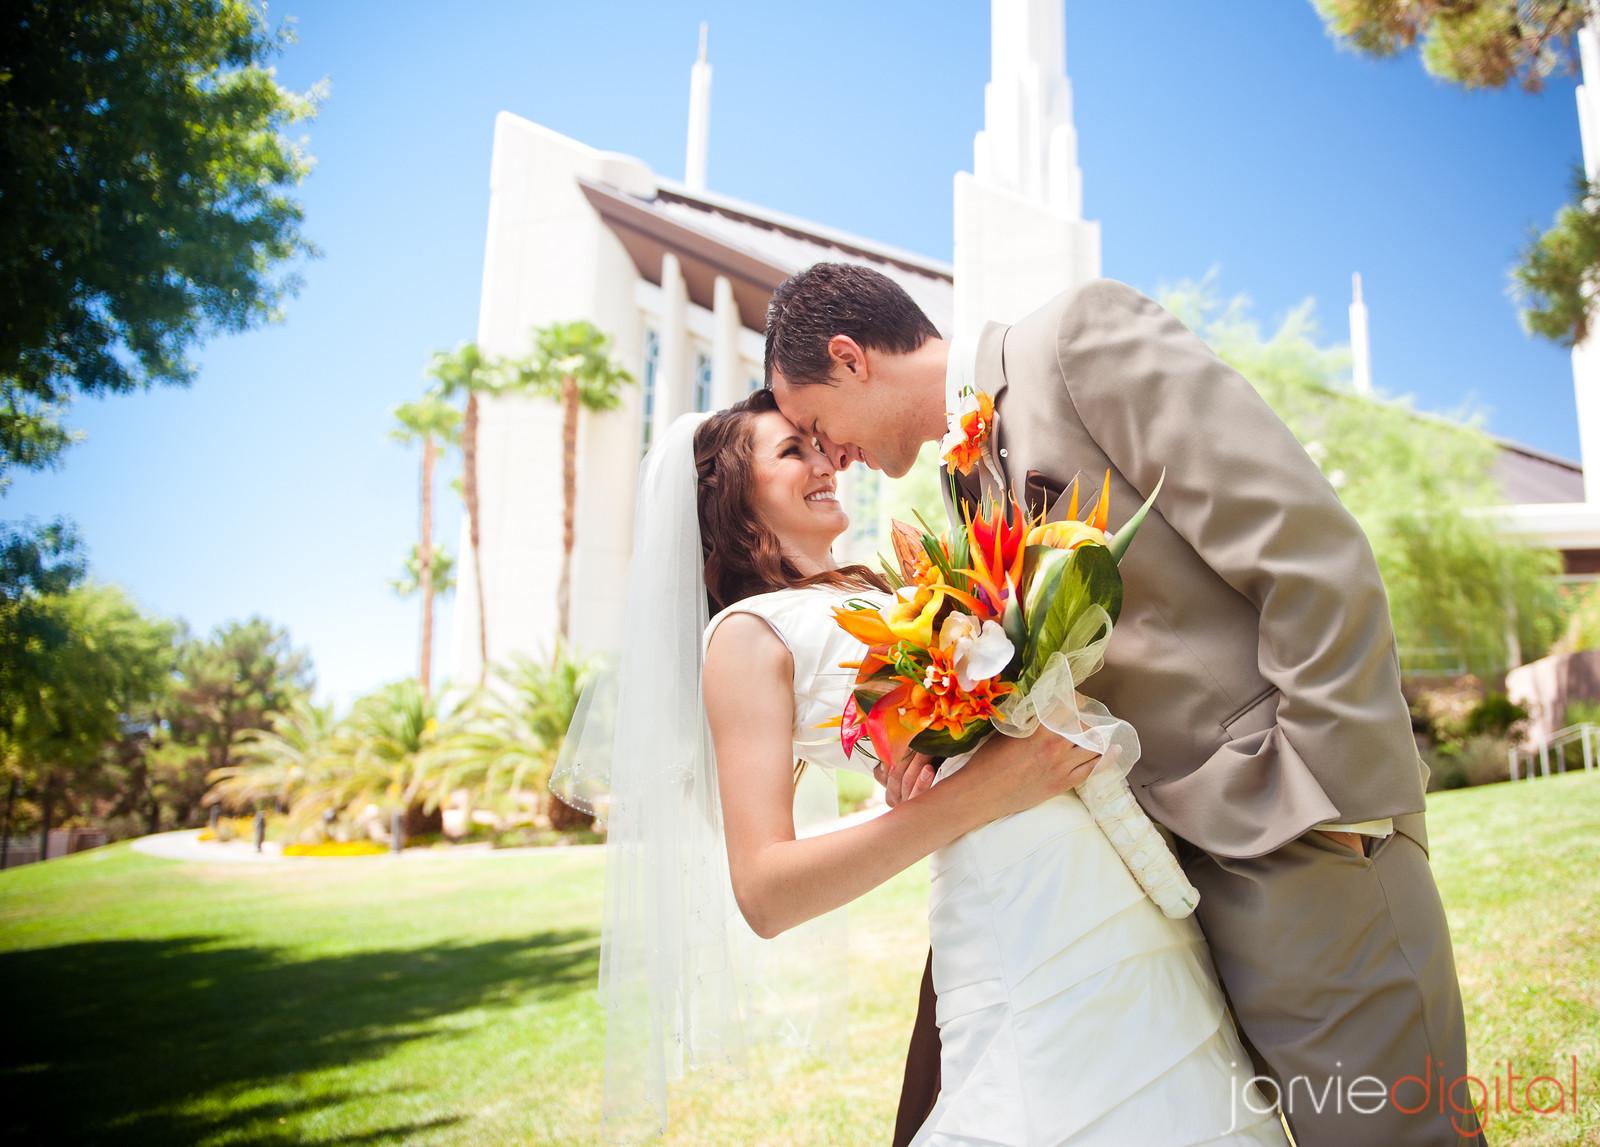 Matrimonio De Amor : Cómo son los matrimonios mormones